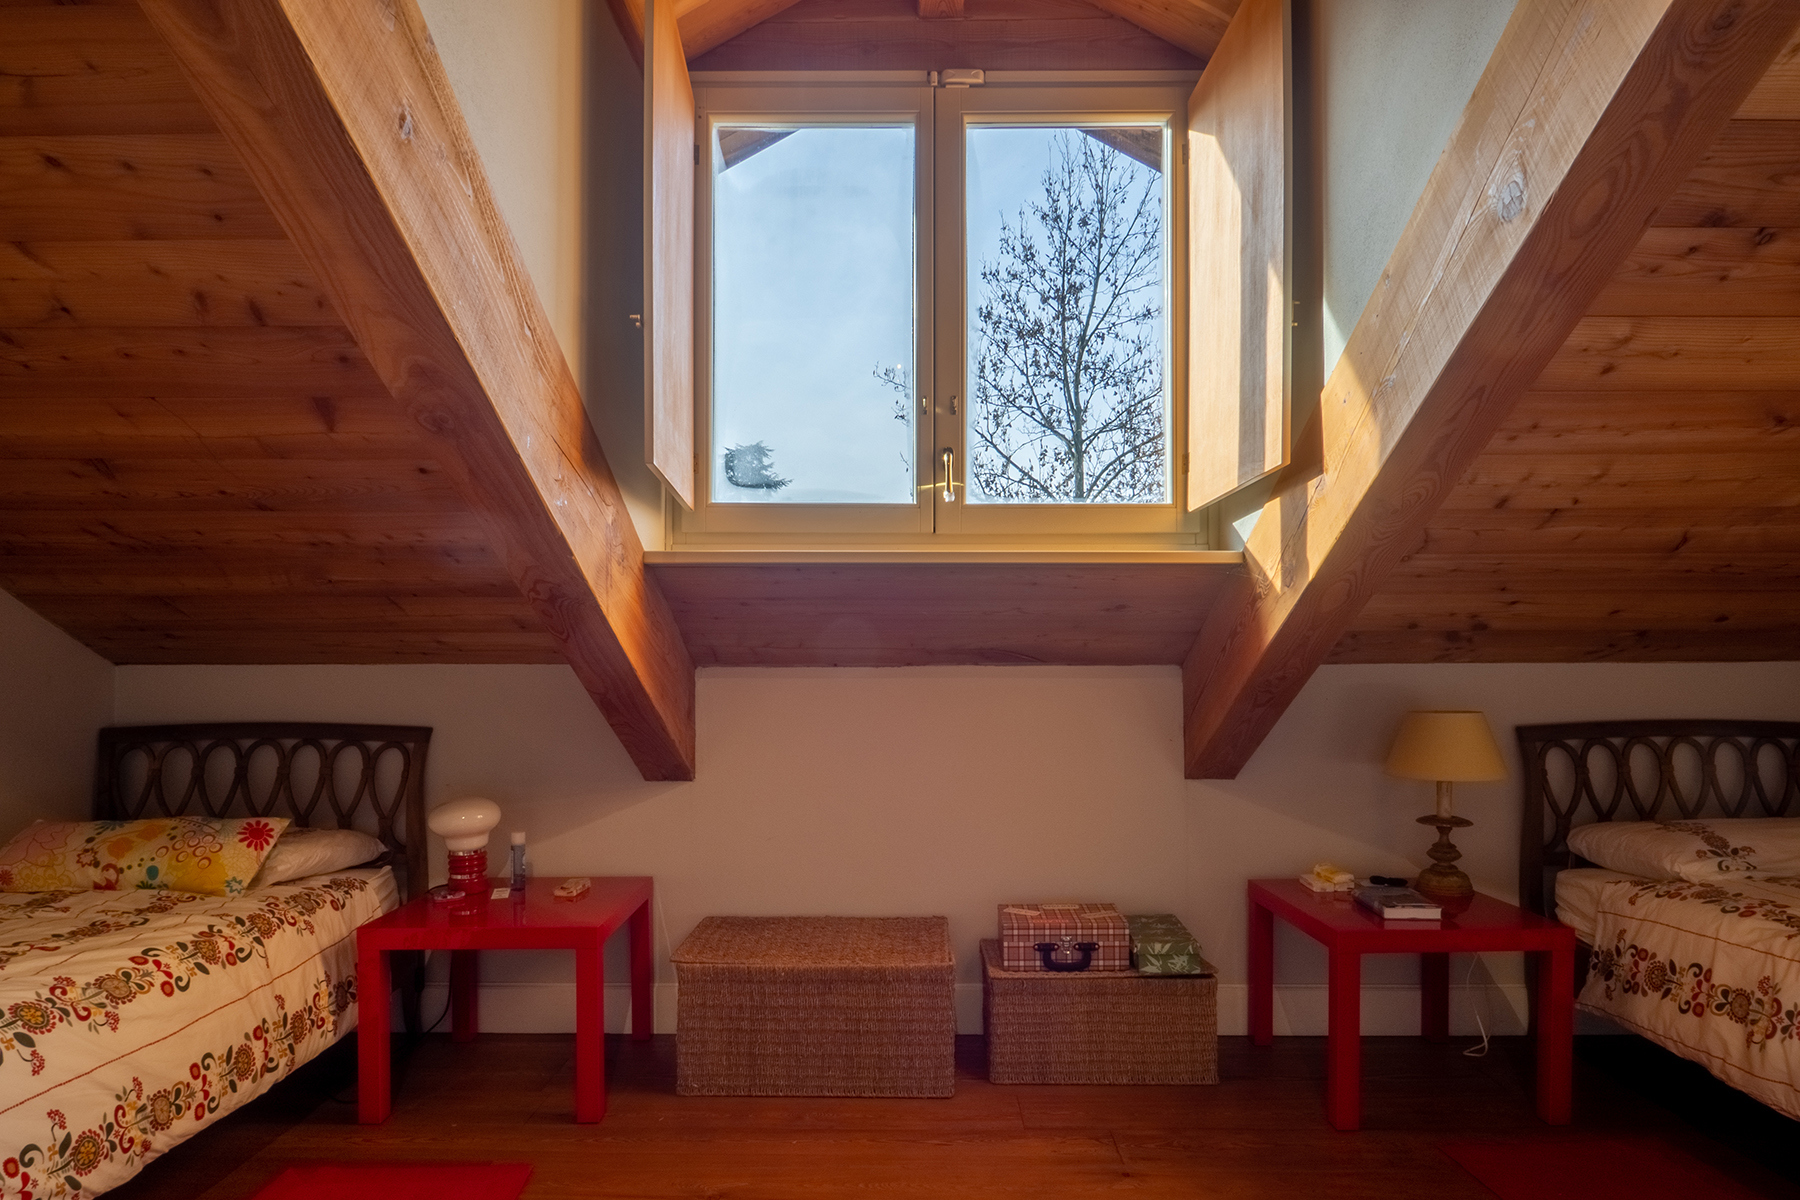 Casa indipendente in Vendita a Torino: 5 locali, 657 mq - Foto 29